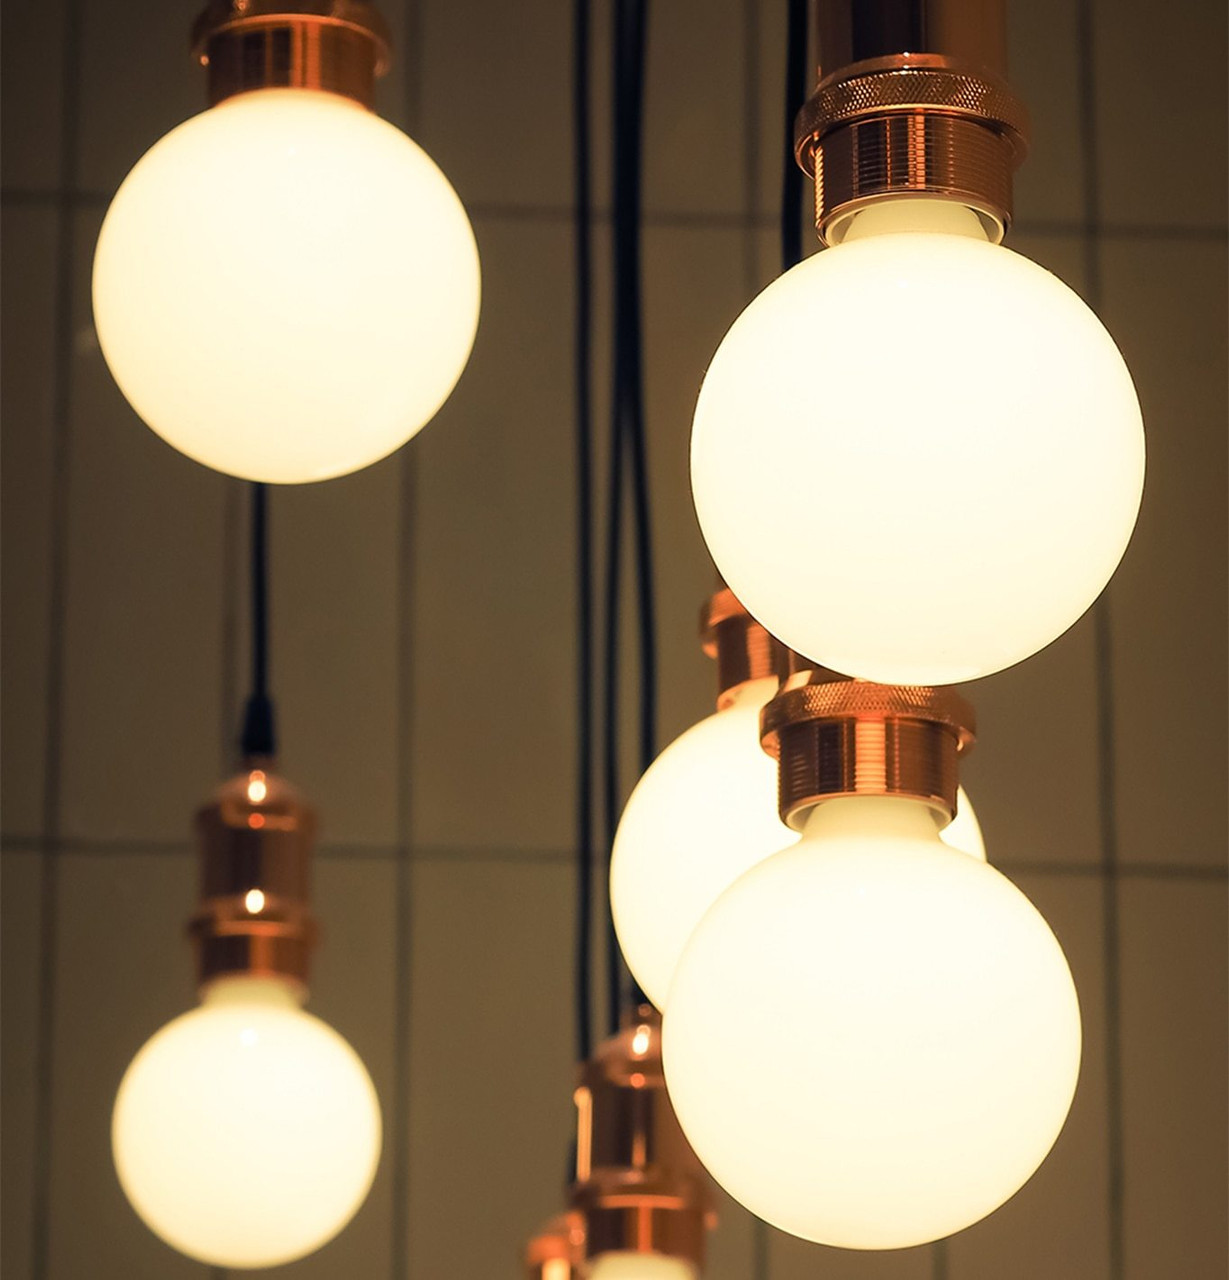 Crompton Lamps LED Globe Filament Light Bulbs